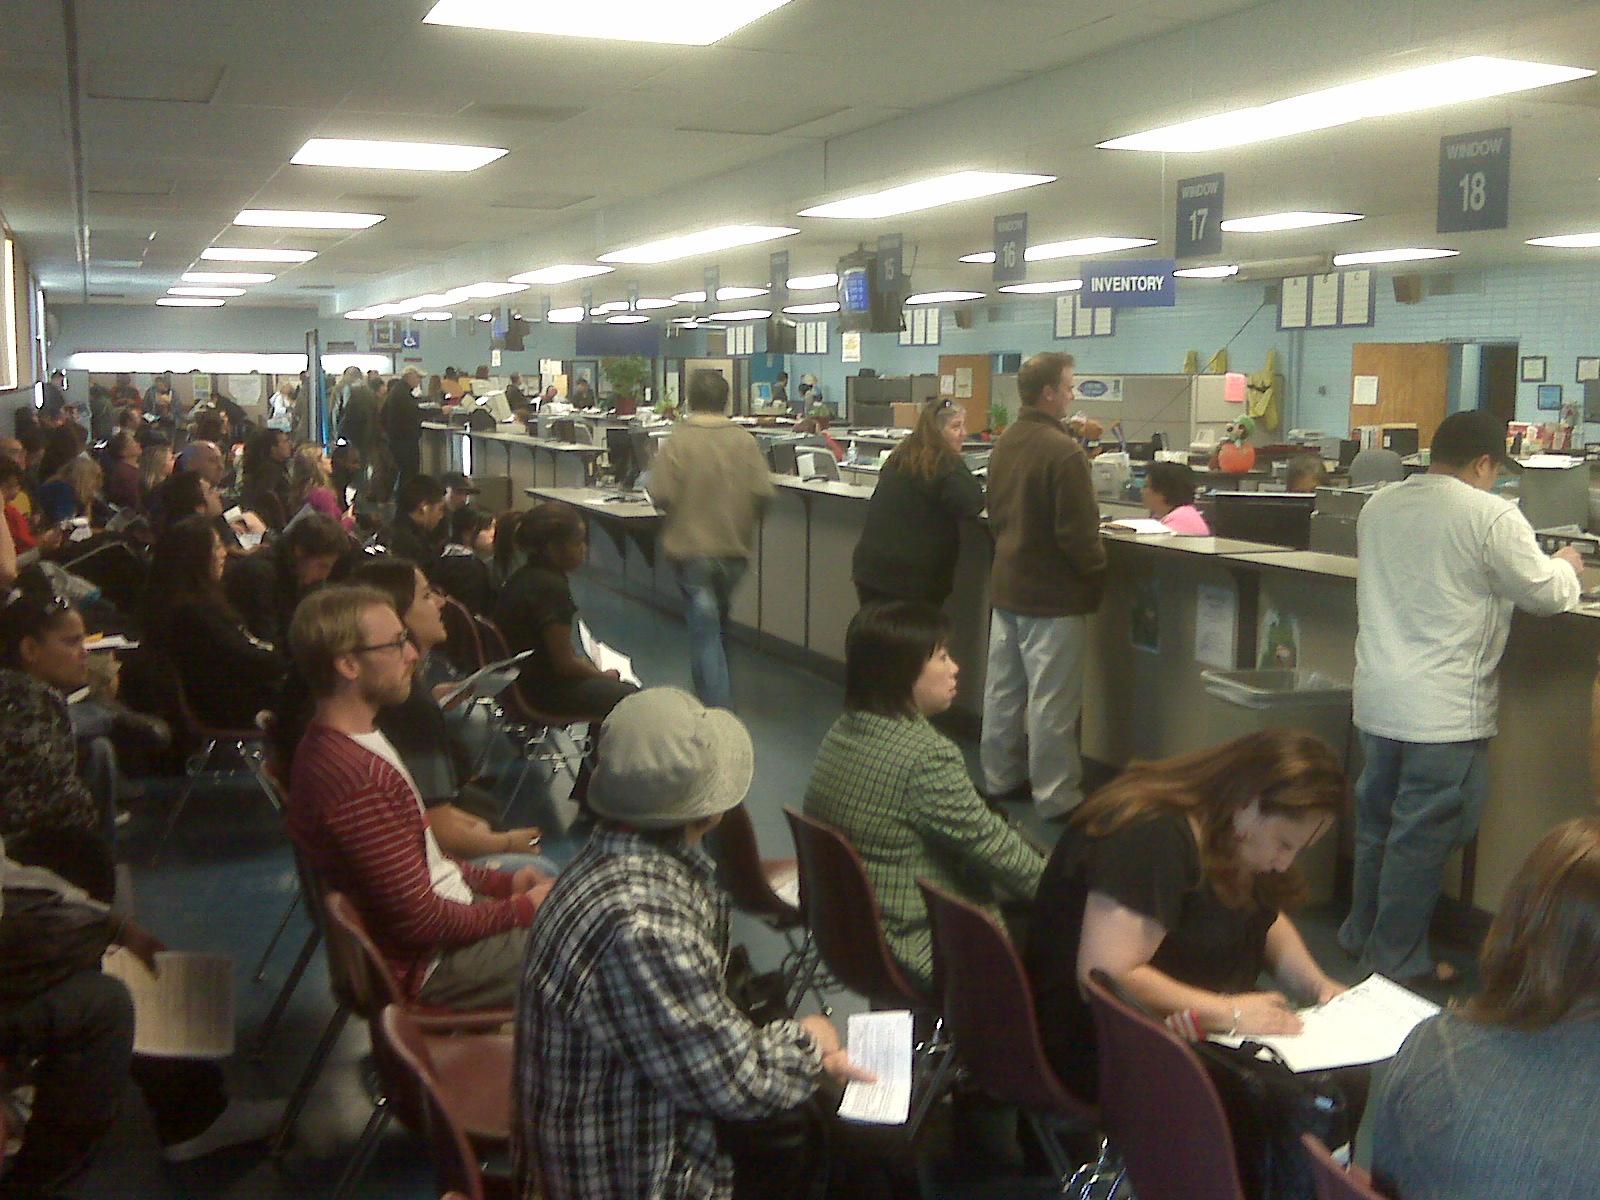 Larainy Days: Wastin' Away Again Inside the DMV